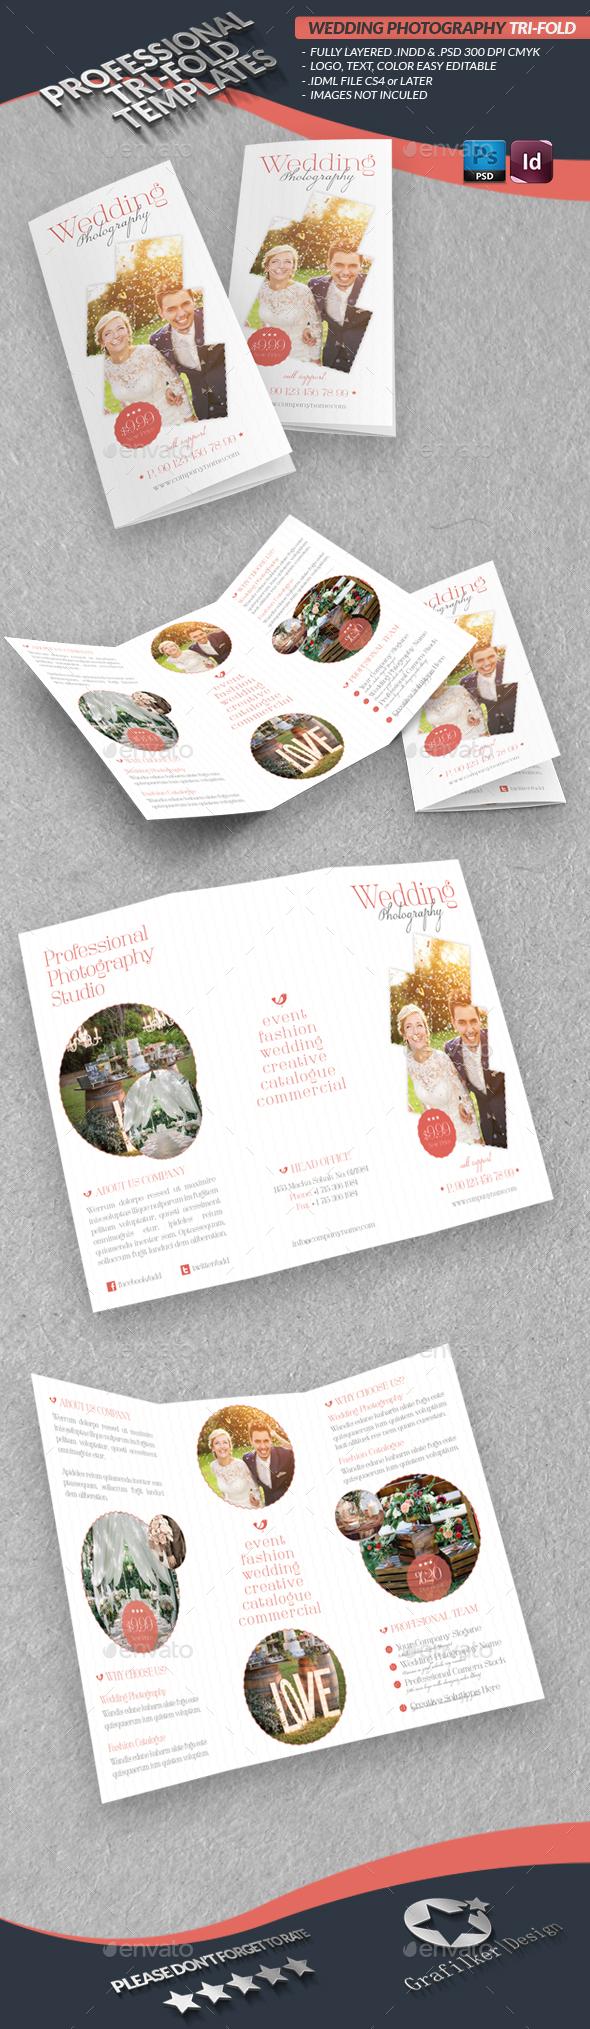 Wedding Photography Tri-Fold Template - Informational Brochures